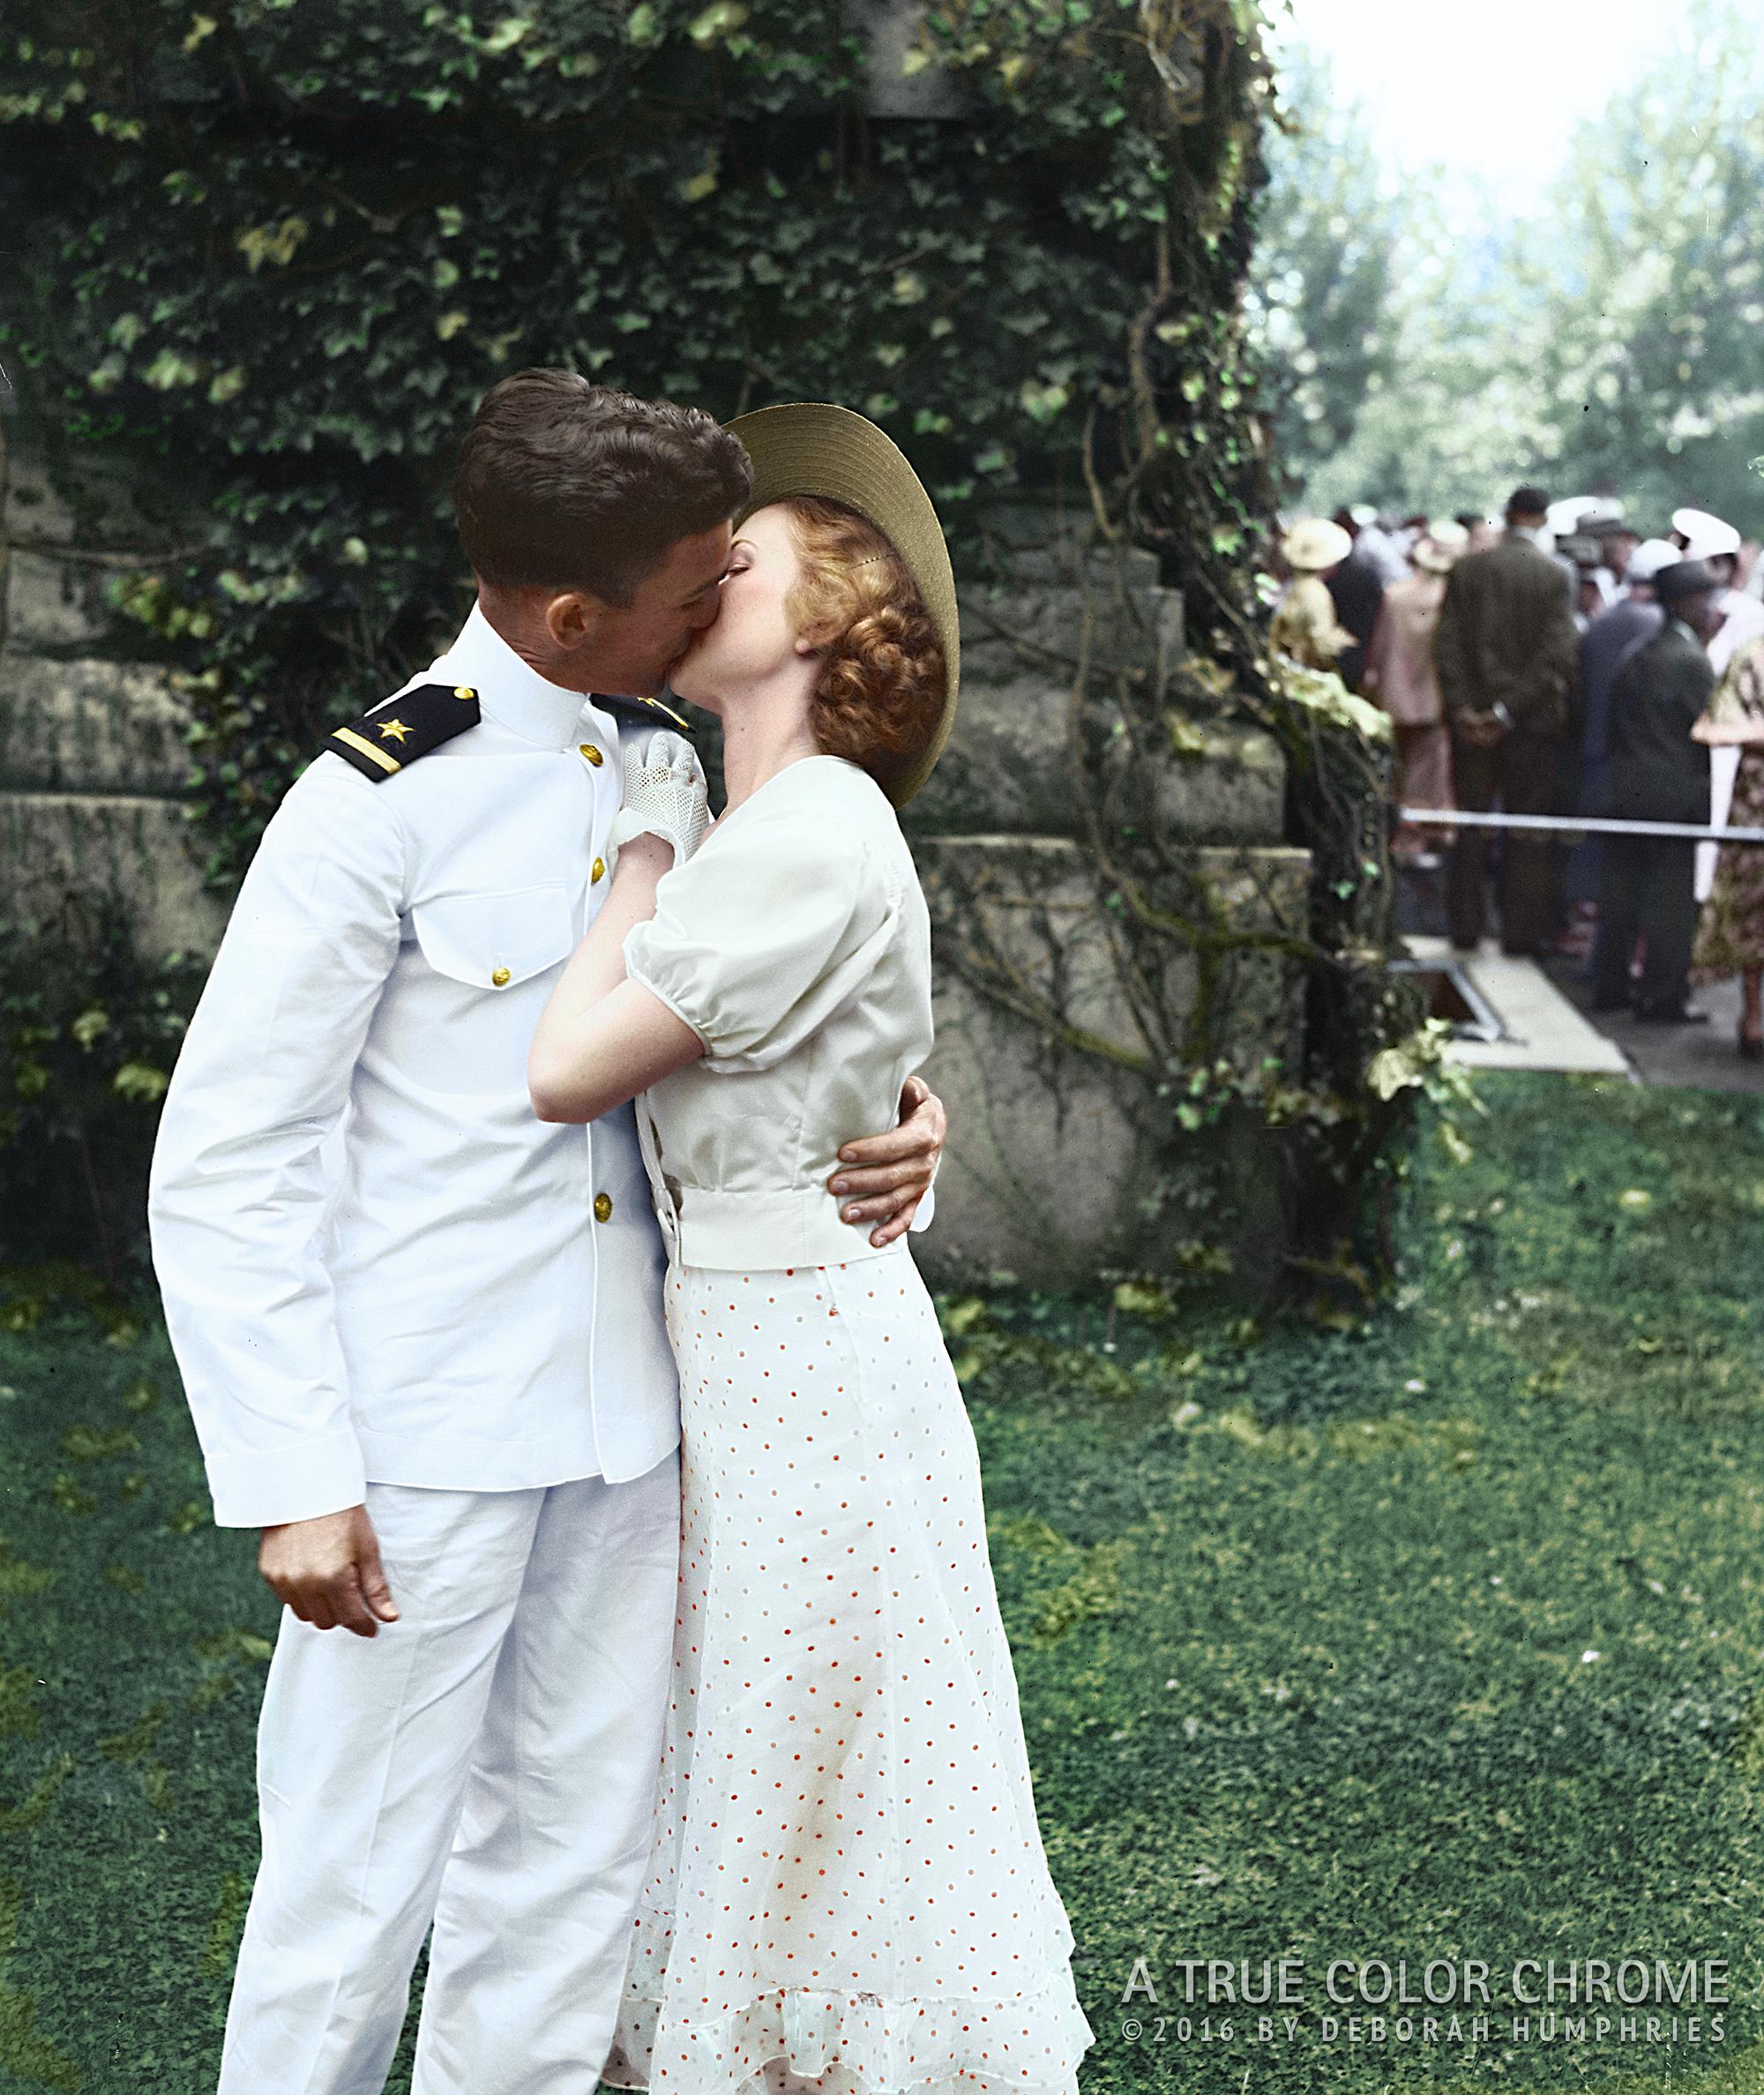 The Kiss, 1934